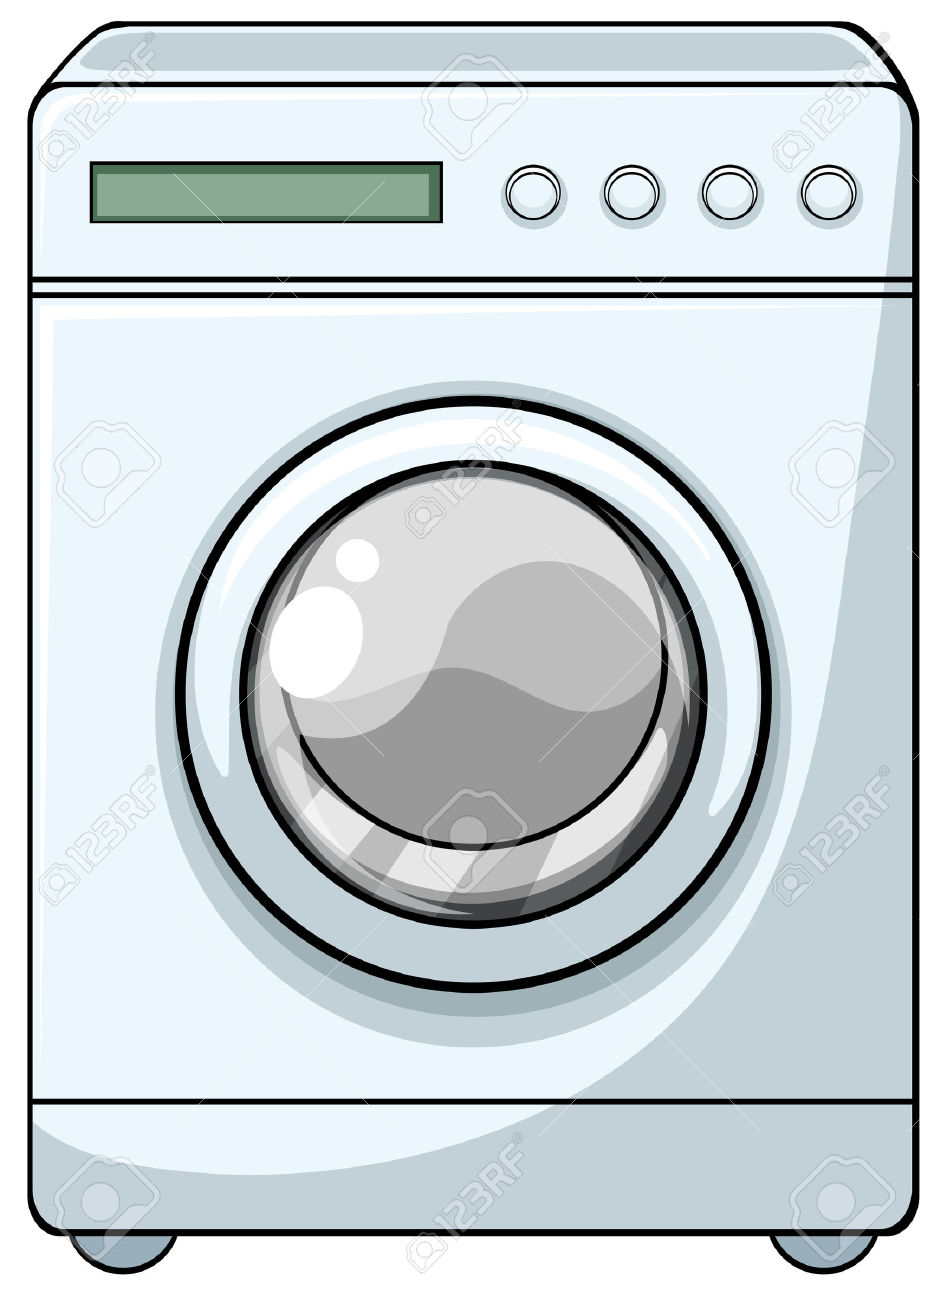 Waschmaschine clipart 2 » Clipart Station.